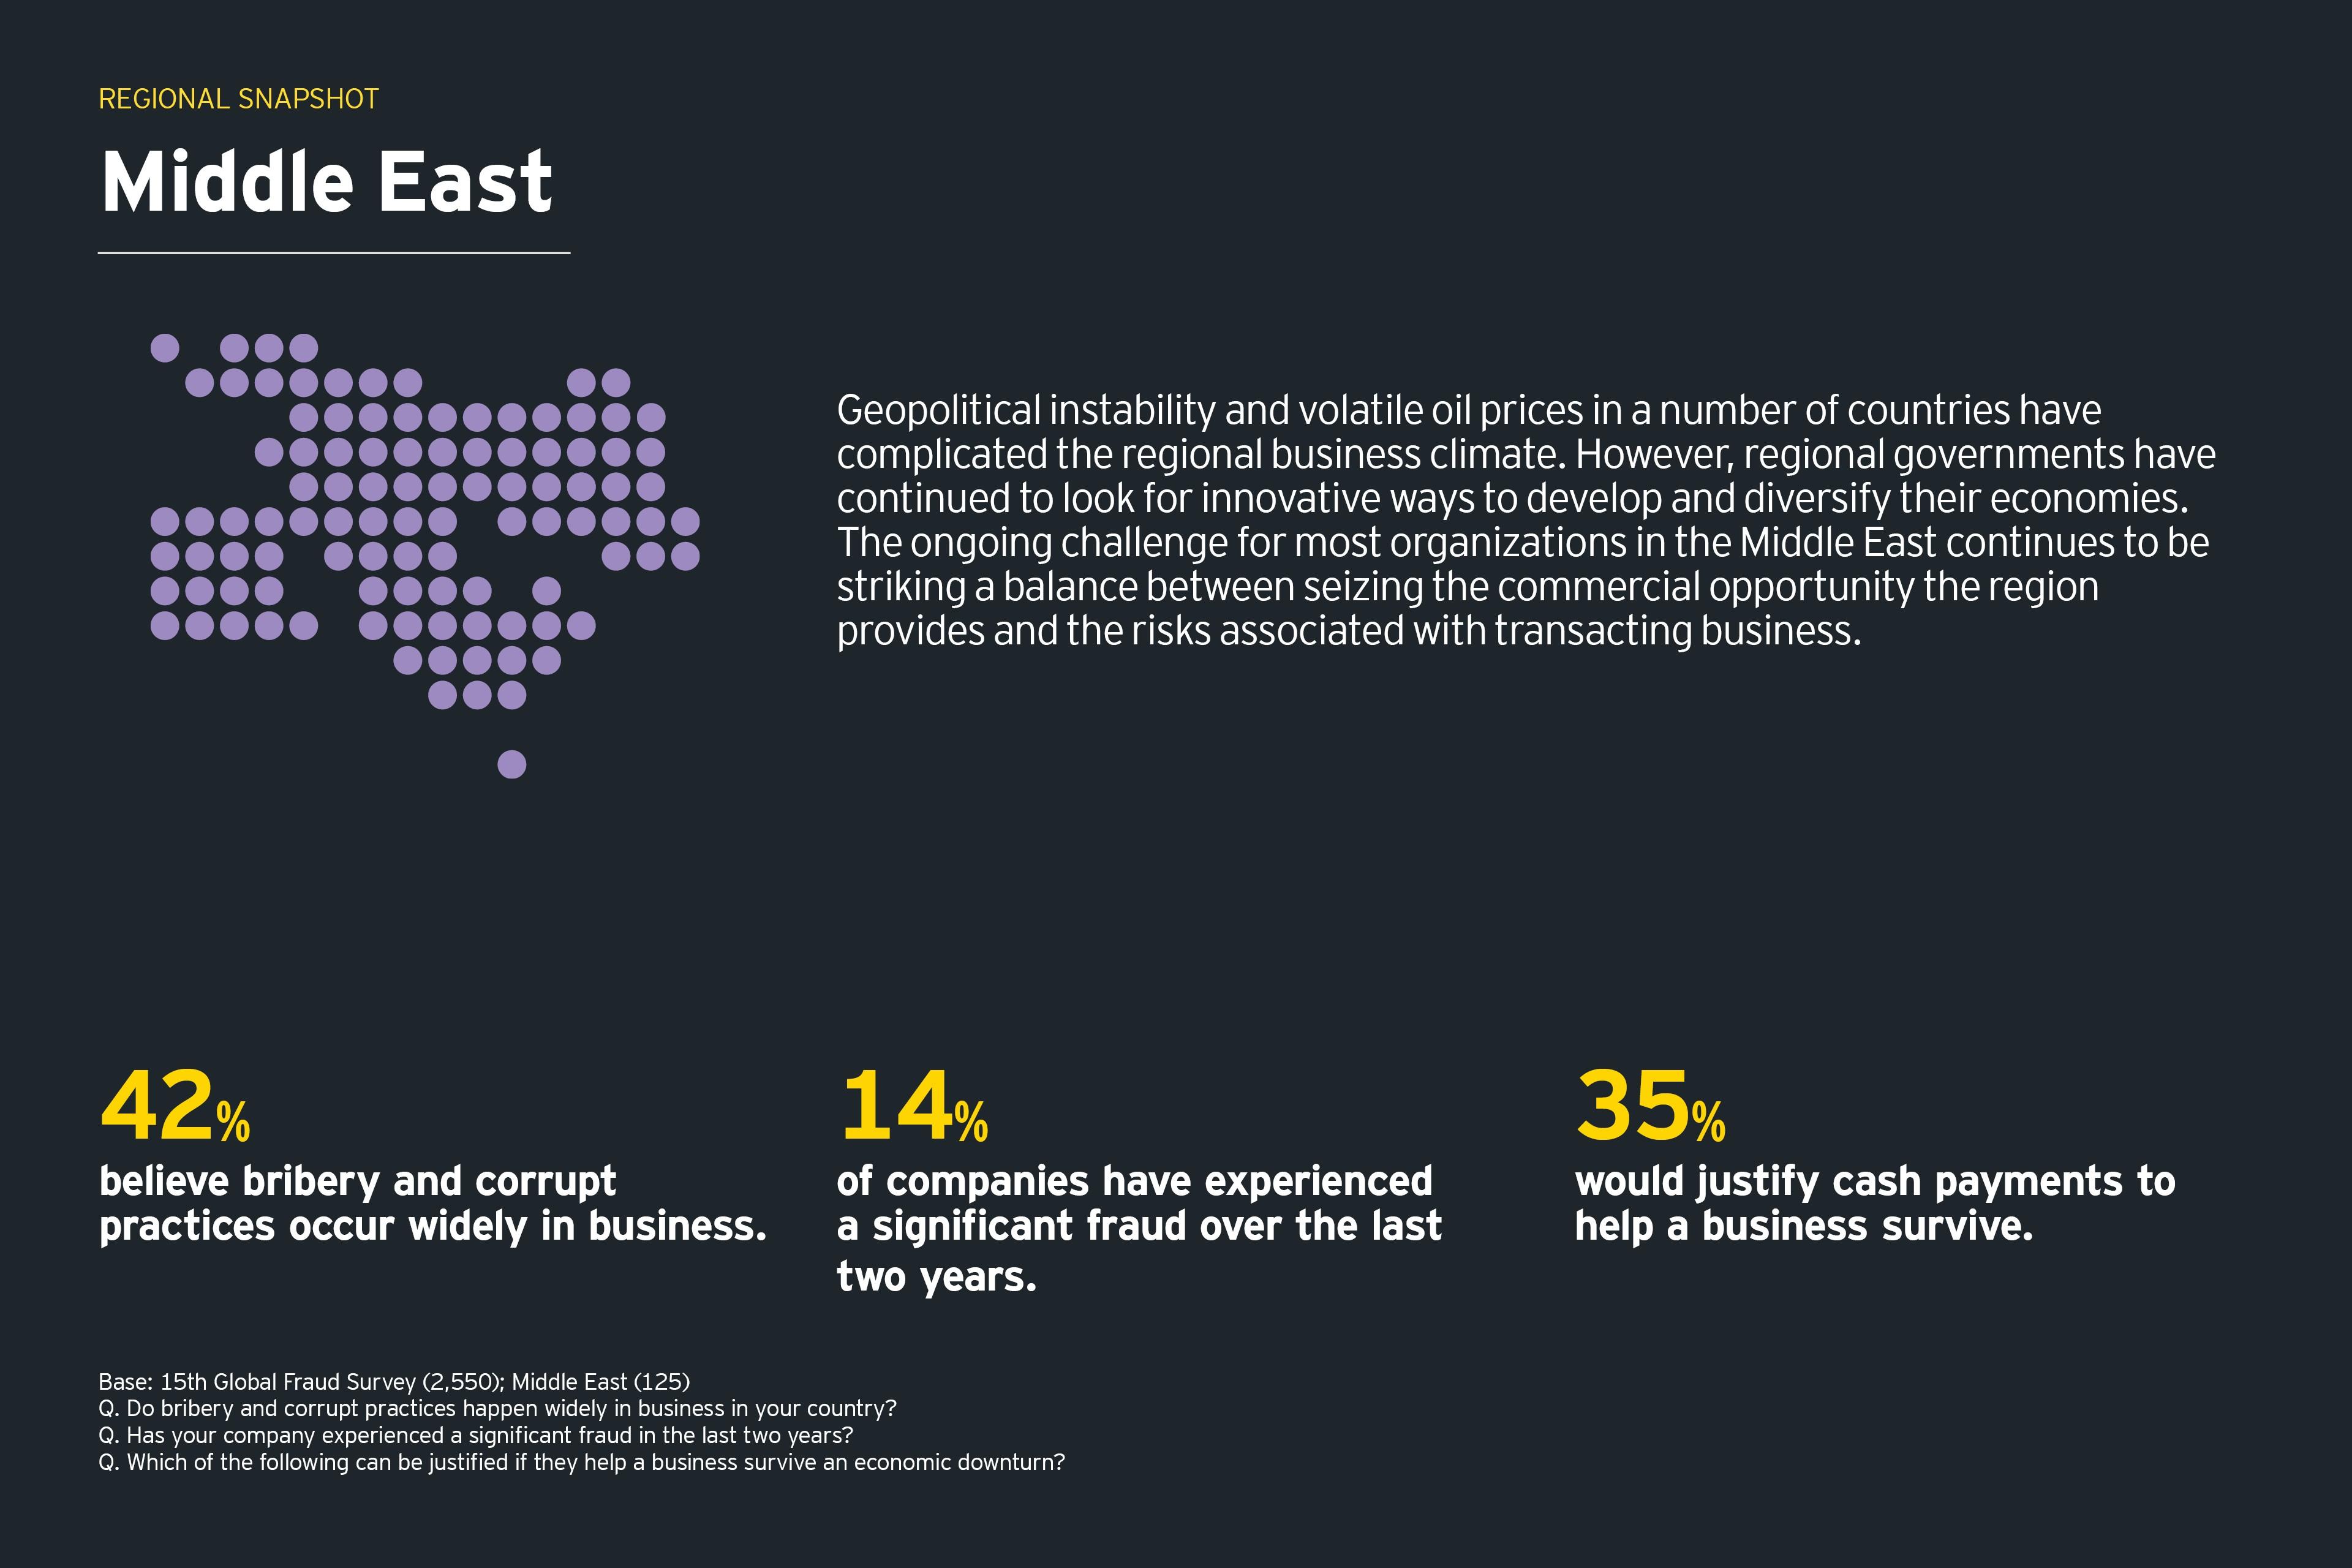 mercados emergentes - Médio Oriente